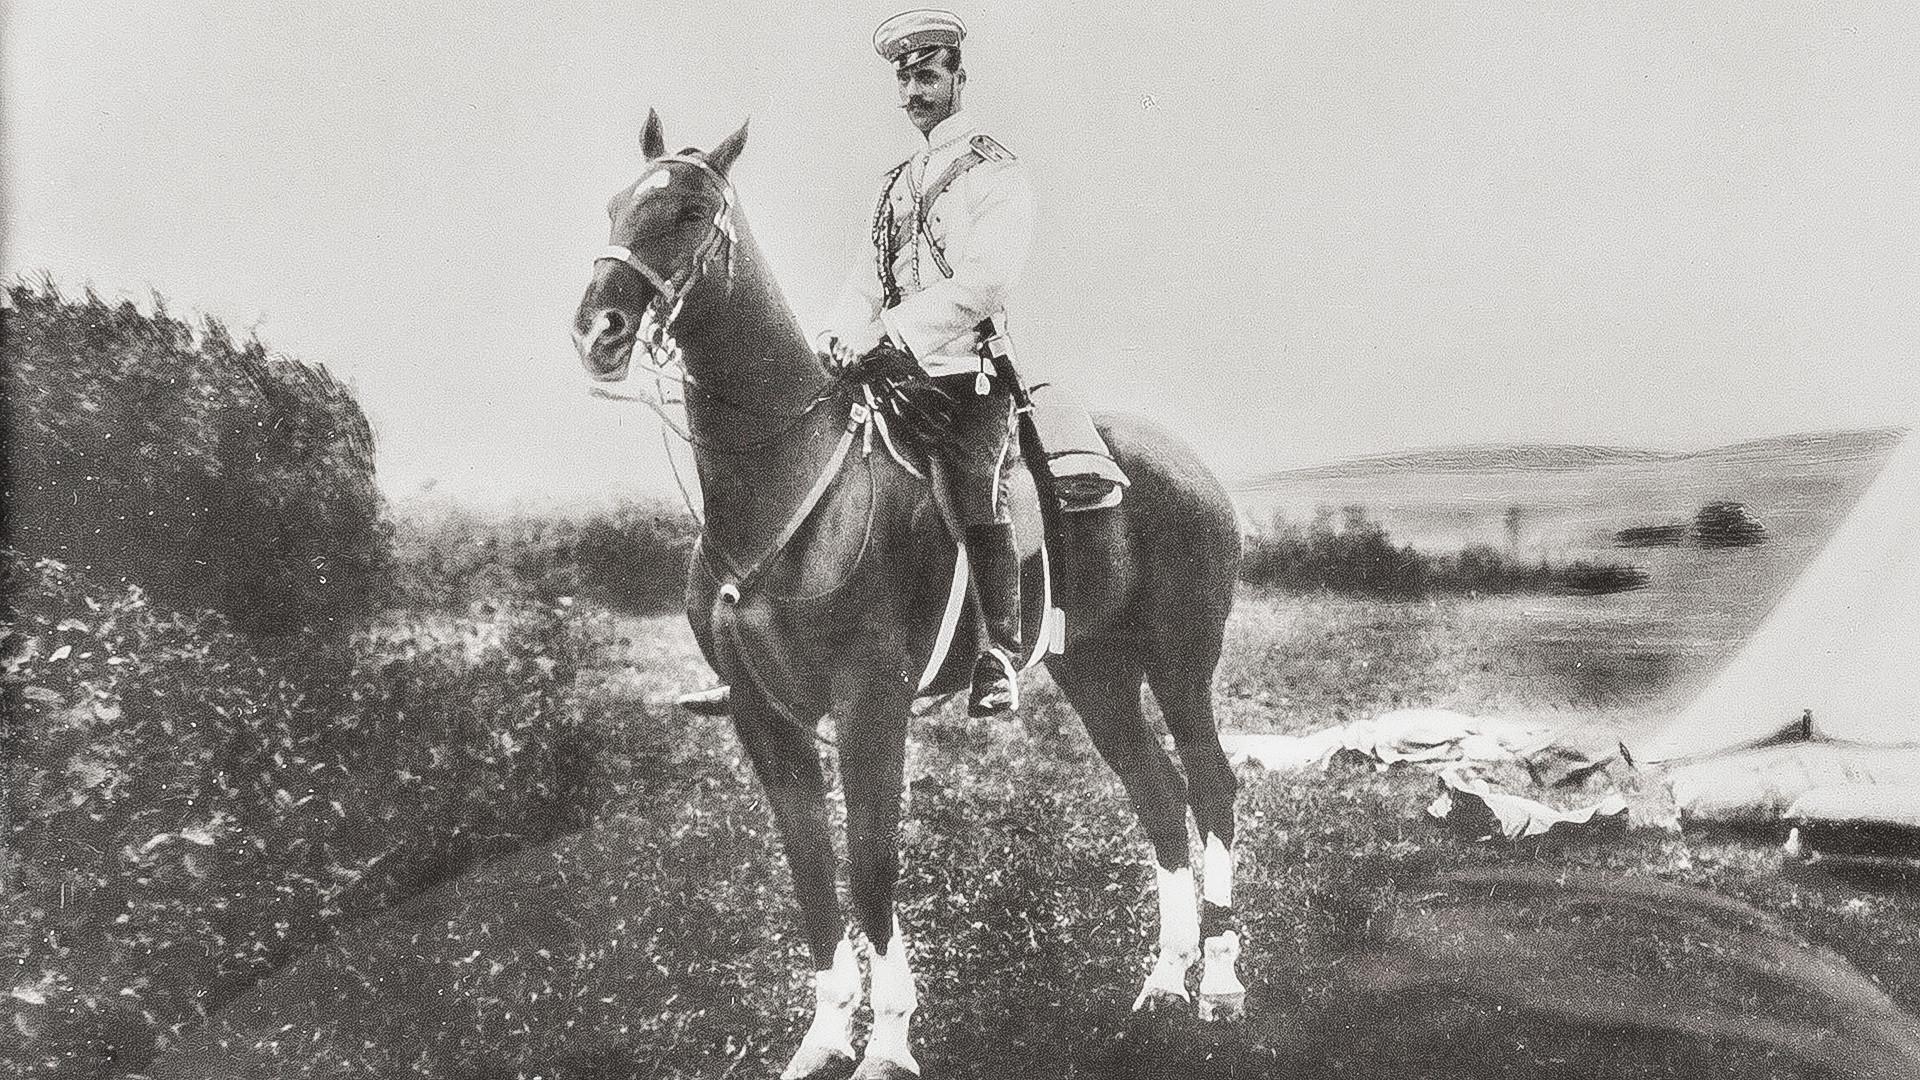 Mikhail Aleksandrovitch (1878-1918)